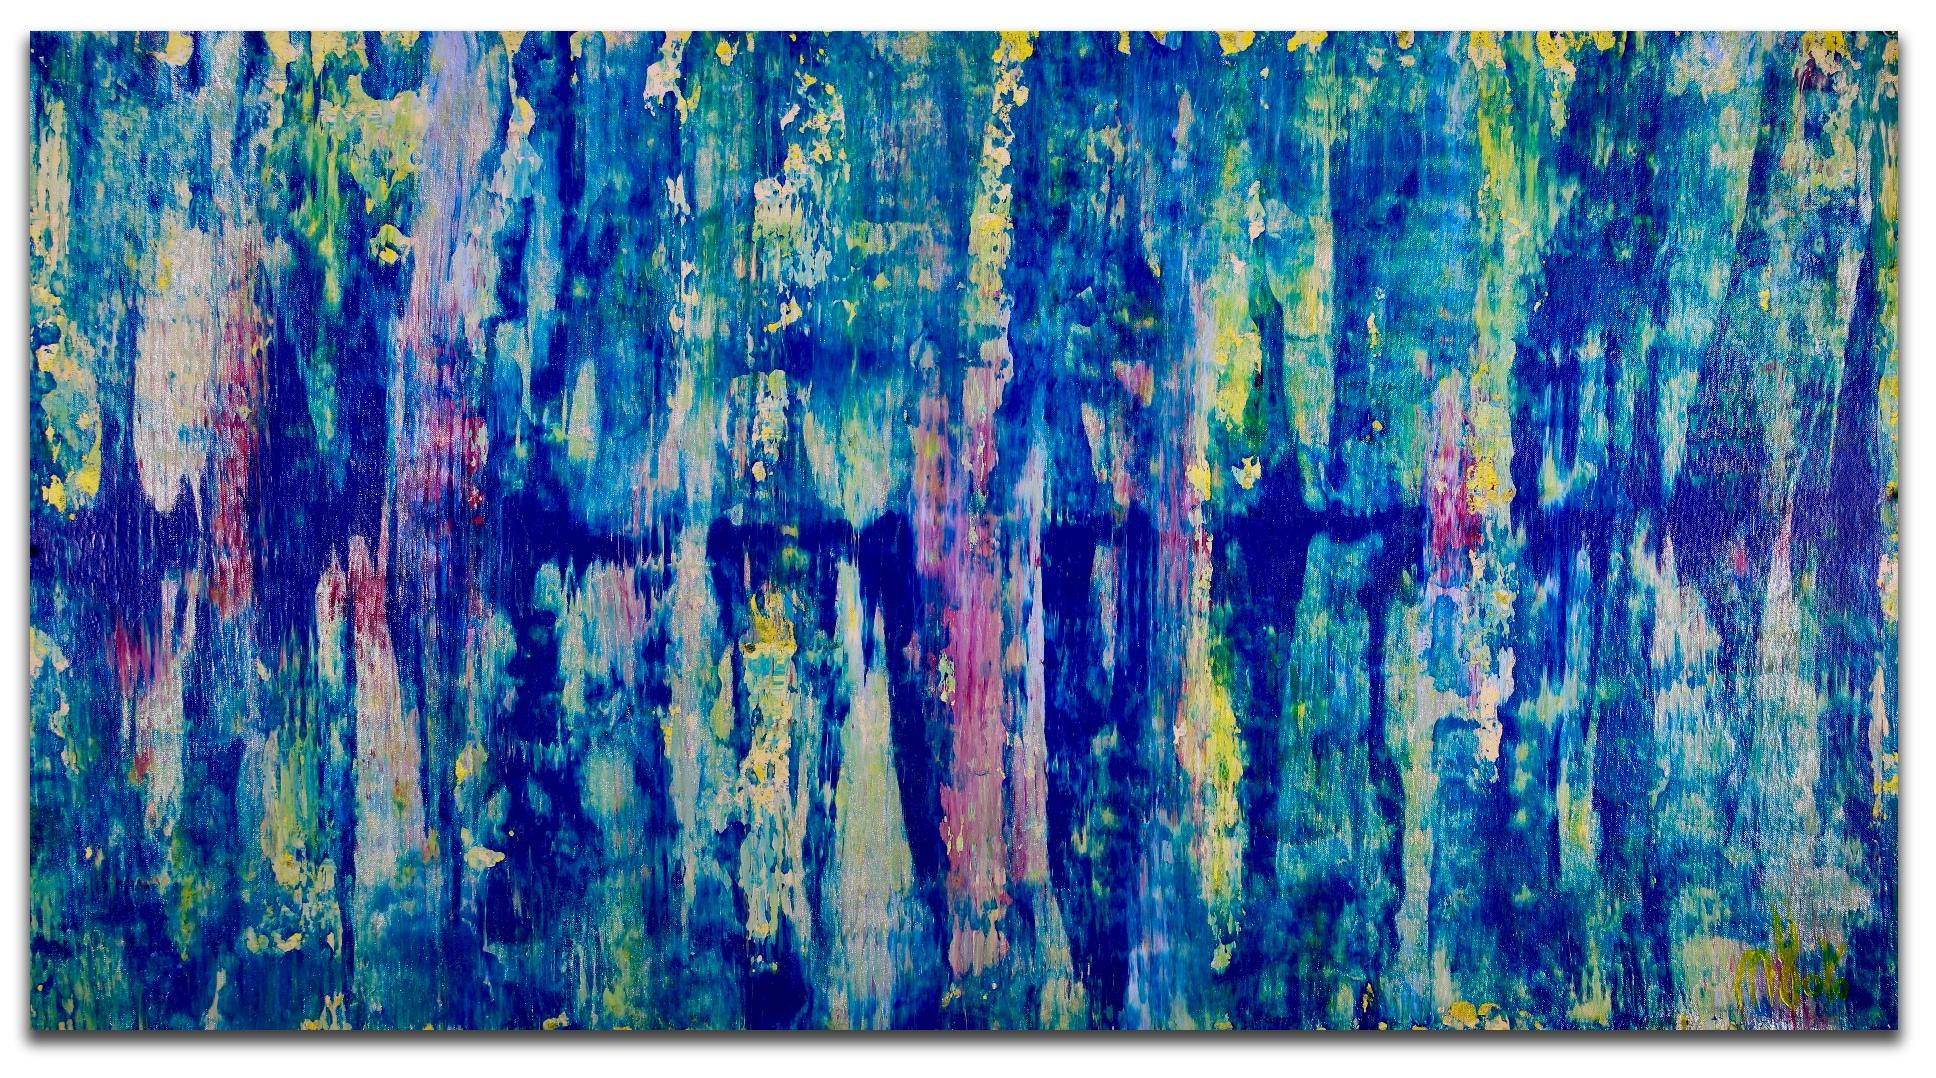 Iridescent aqua spectra by Nestor Toro (2018) Abstract Acrylic painting